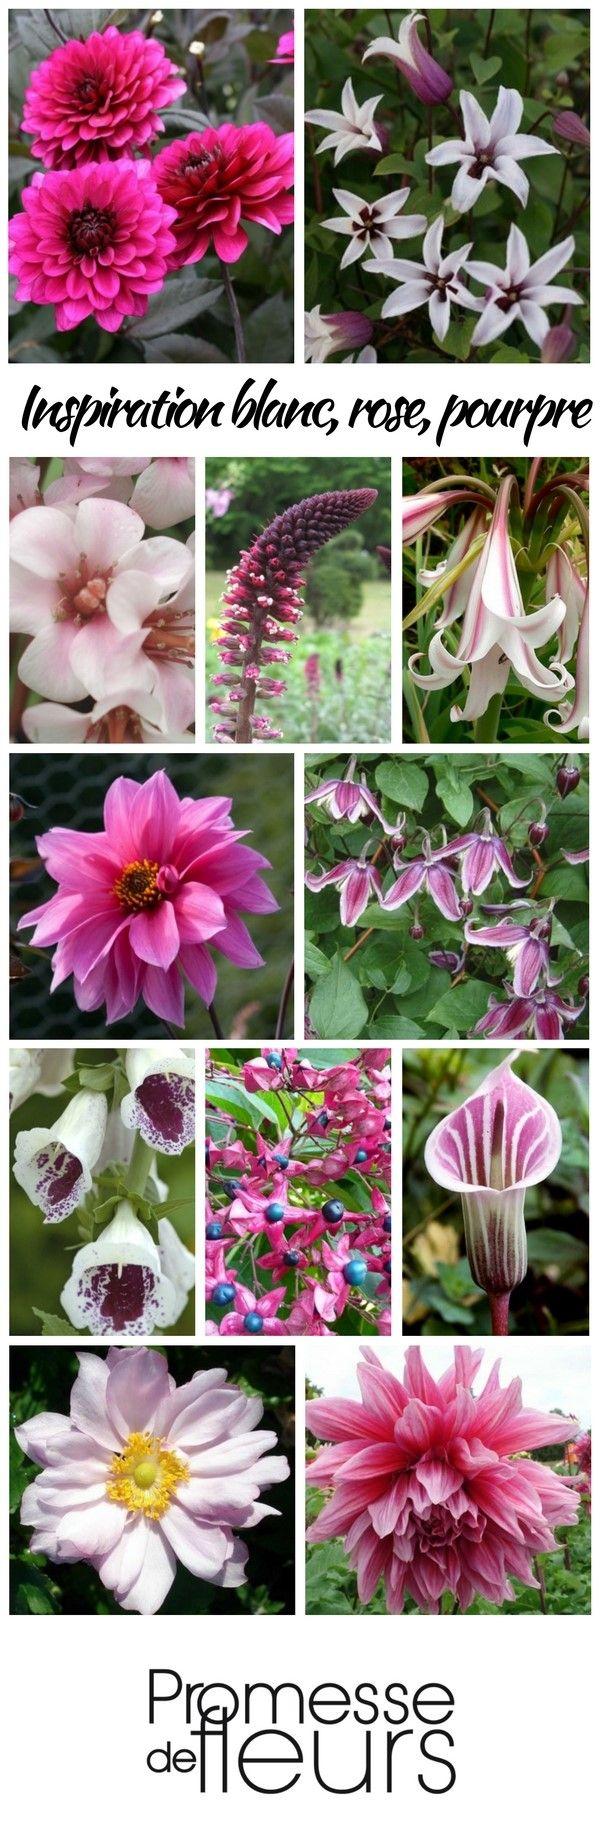 Scène de jardin blanc, rose et pourpre.